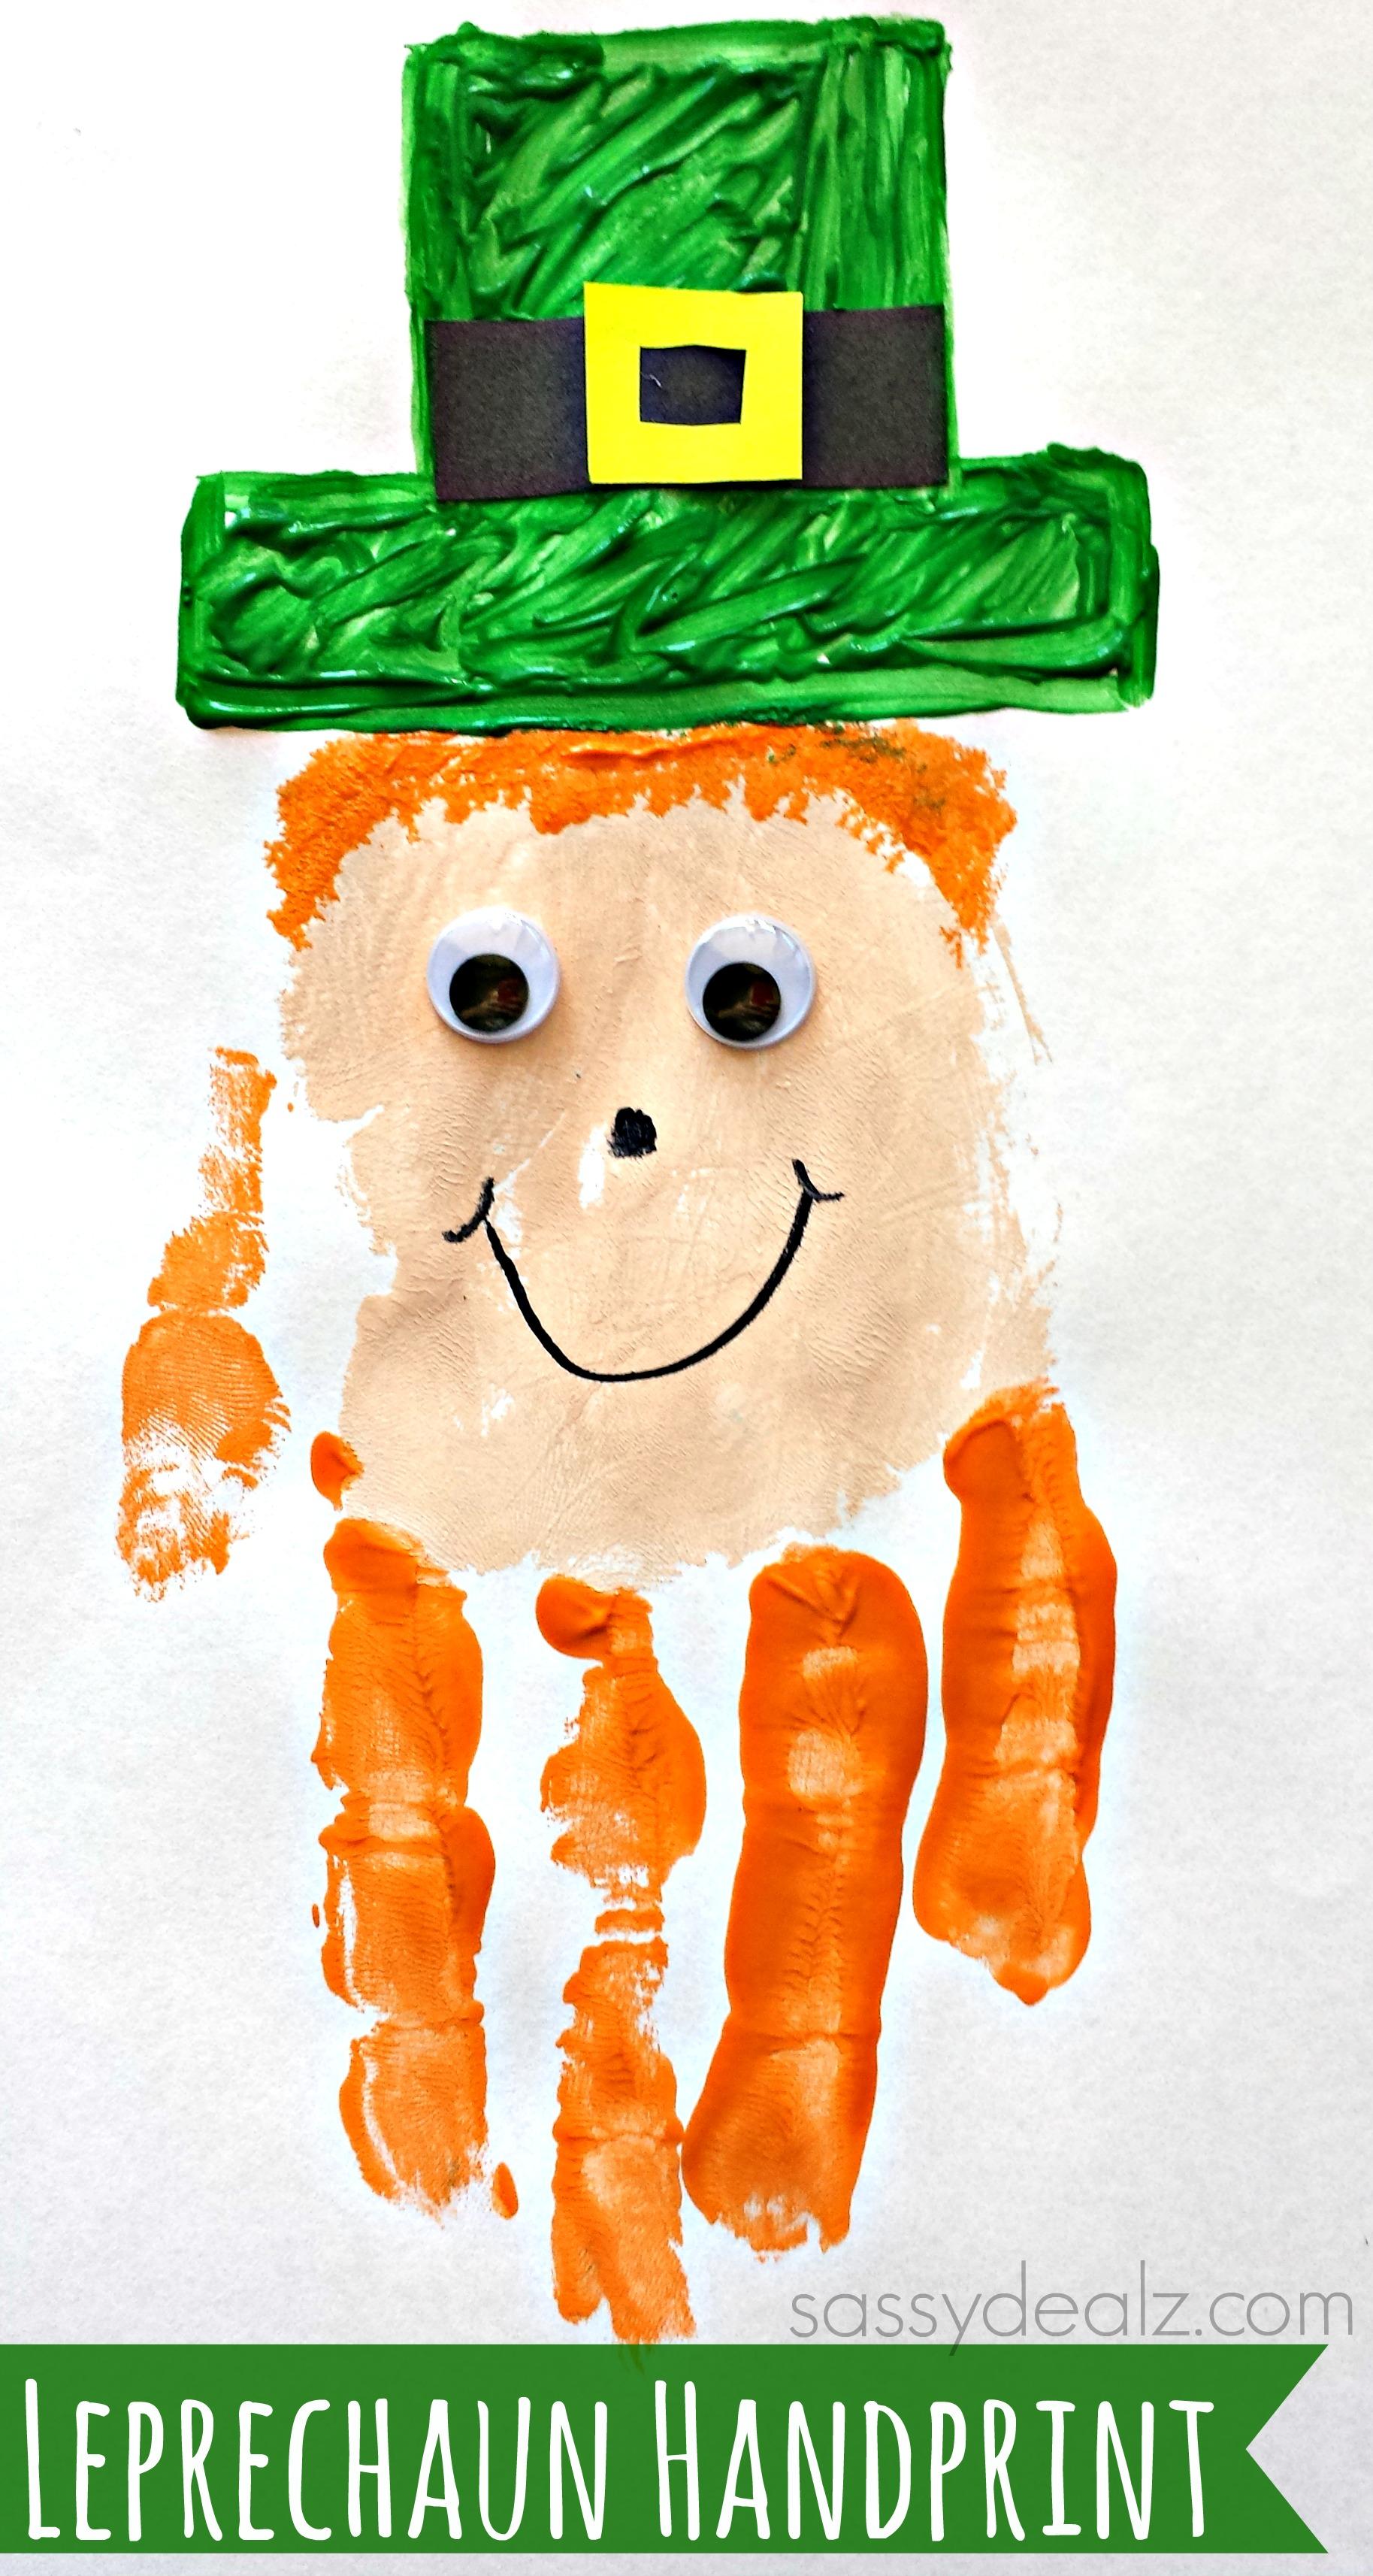 Leprechaun Handprint Craft For Kids St Patricks Day Idea